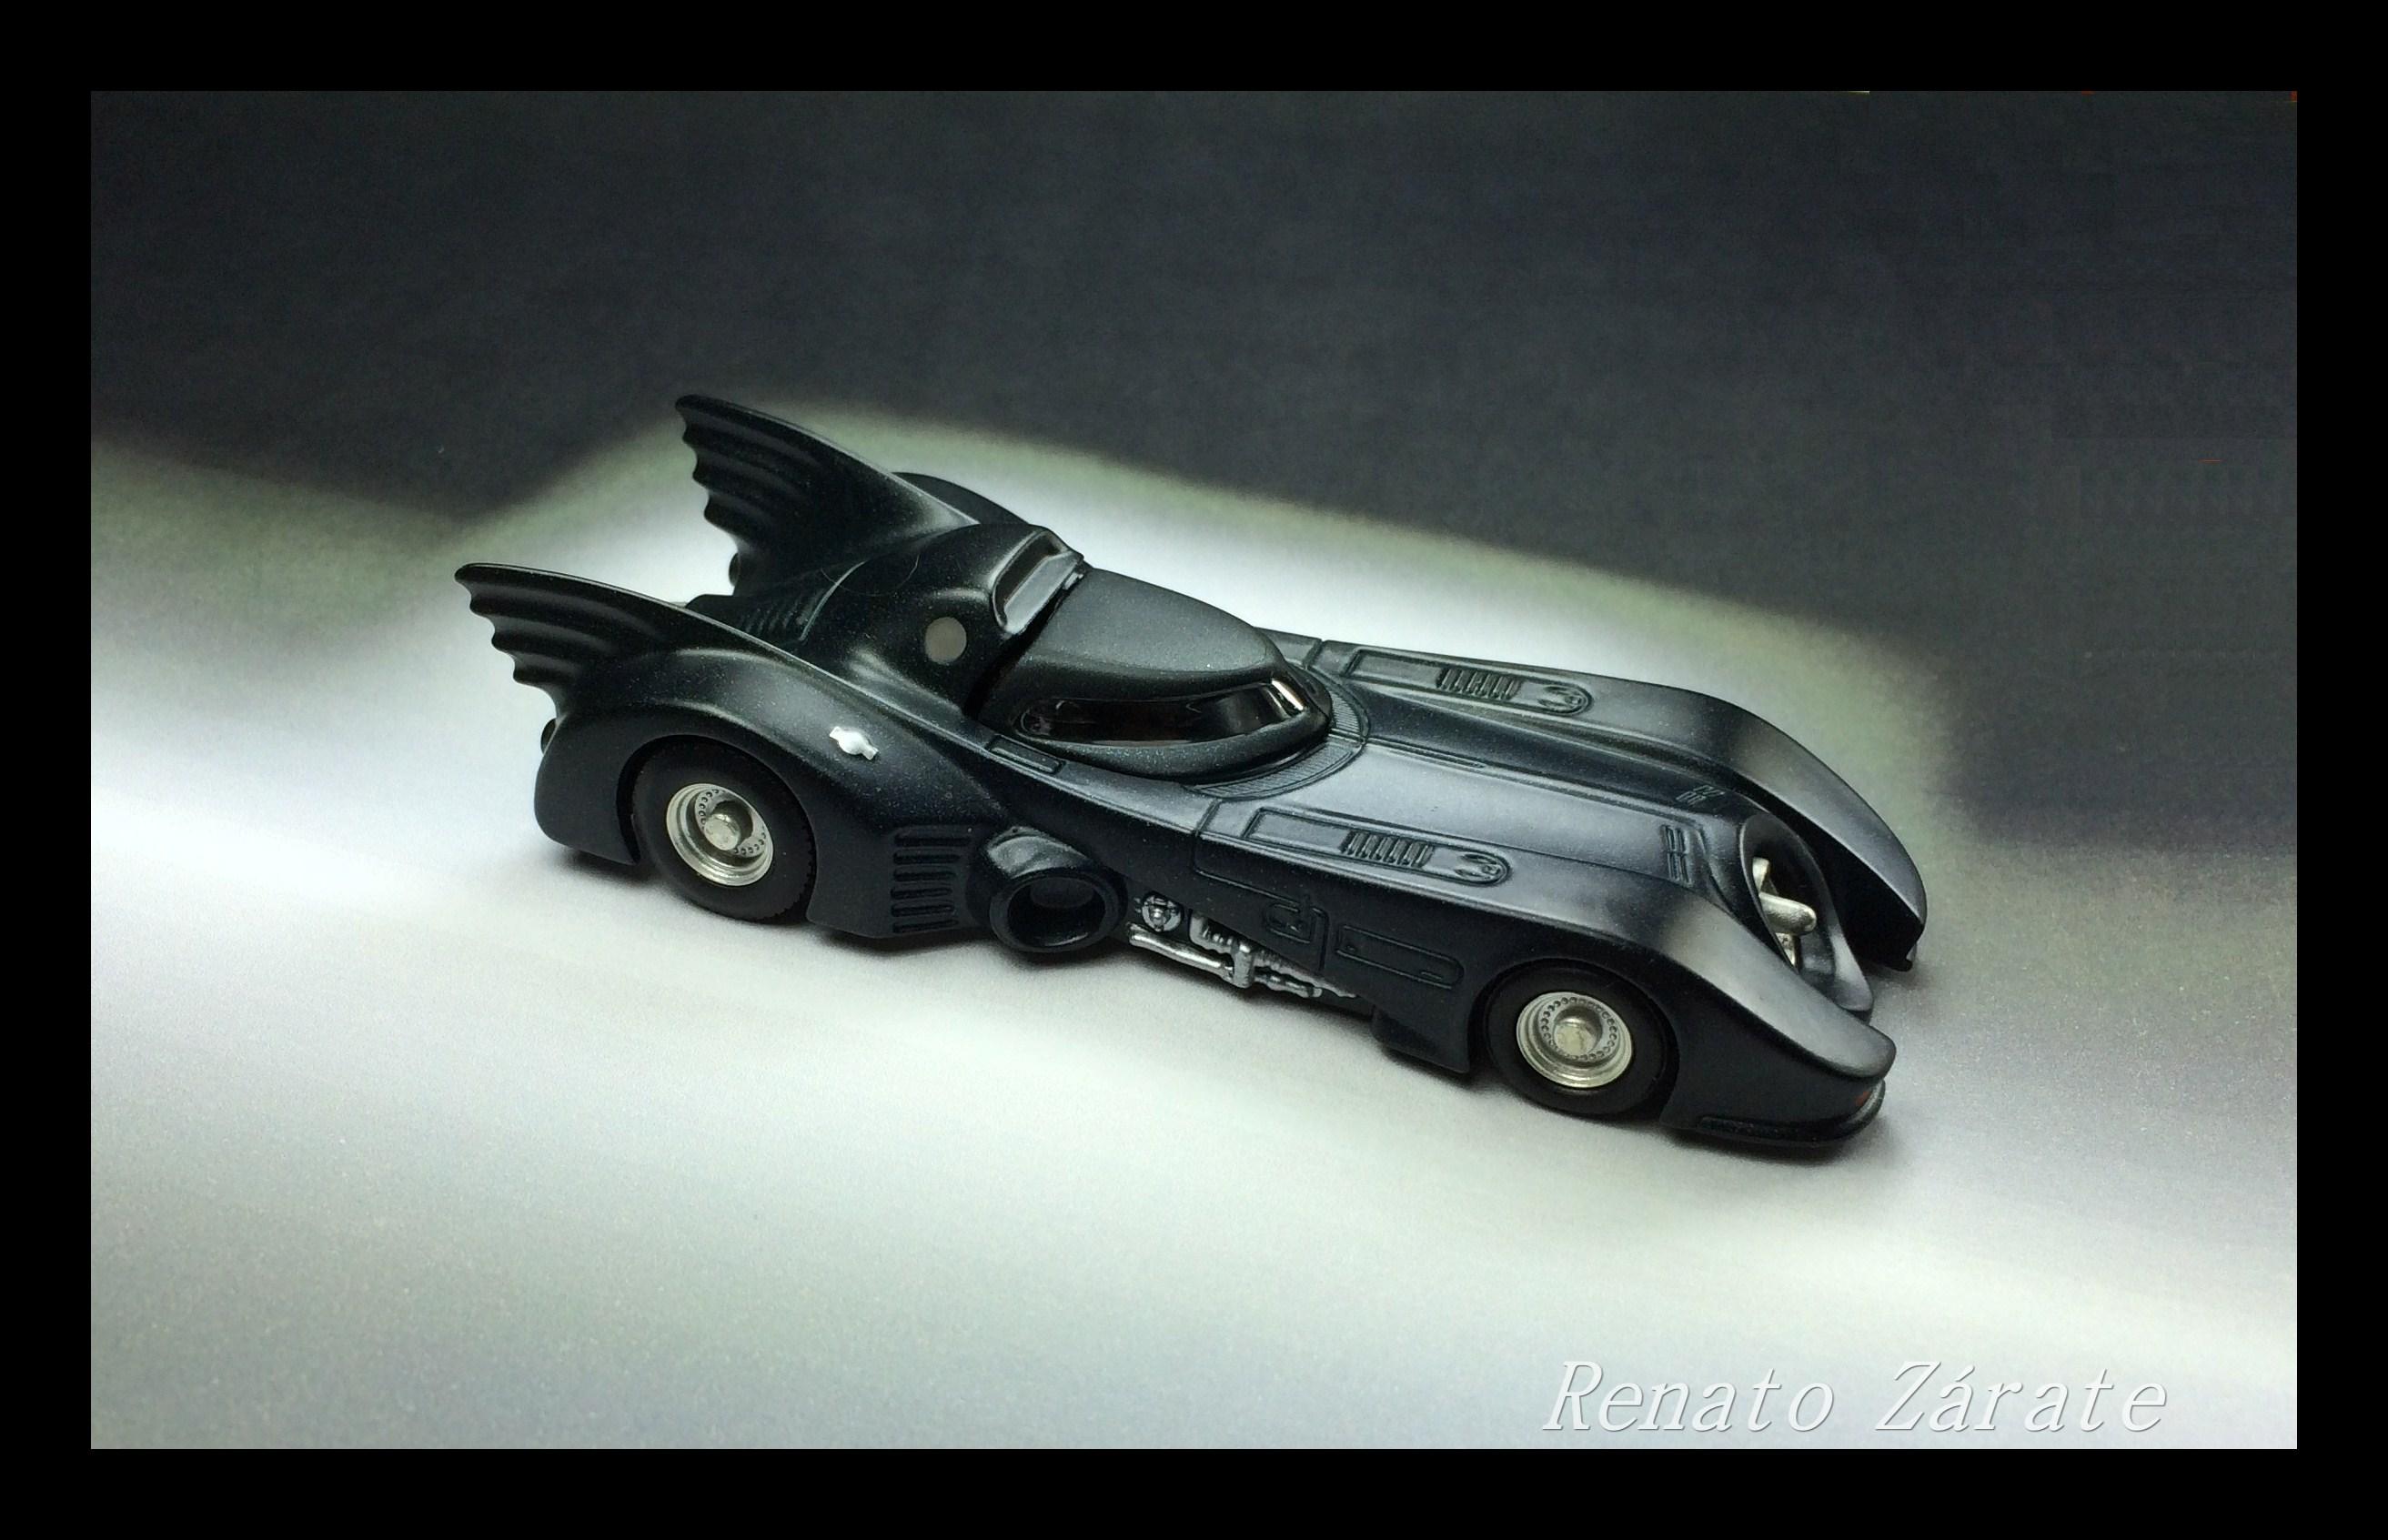 1989 Batmobile (100%)